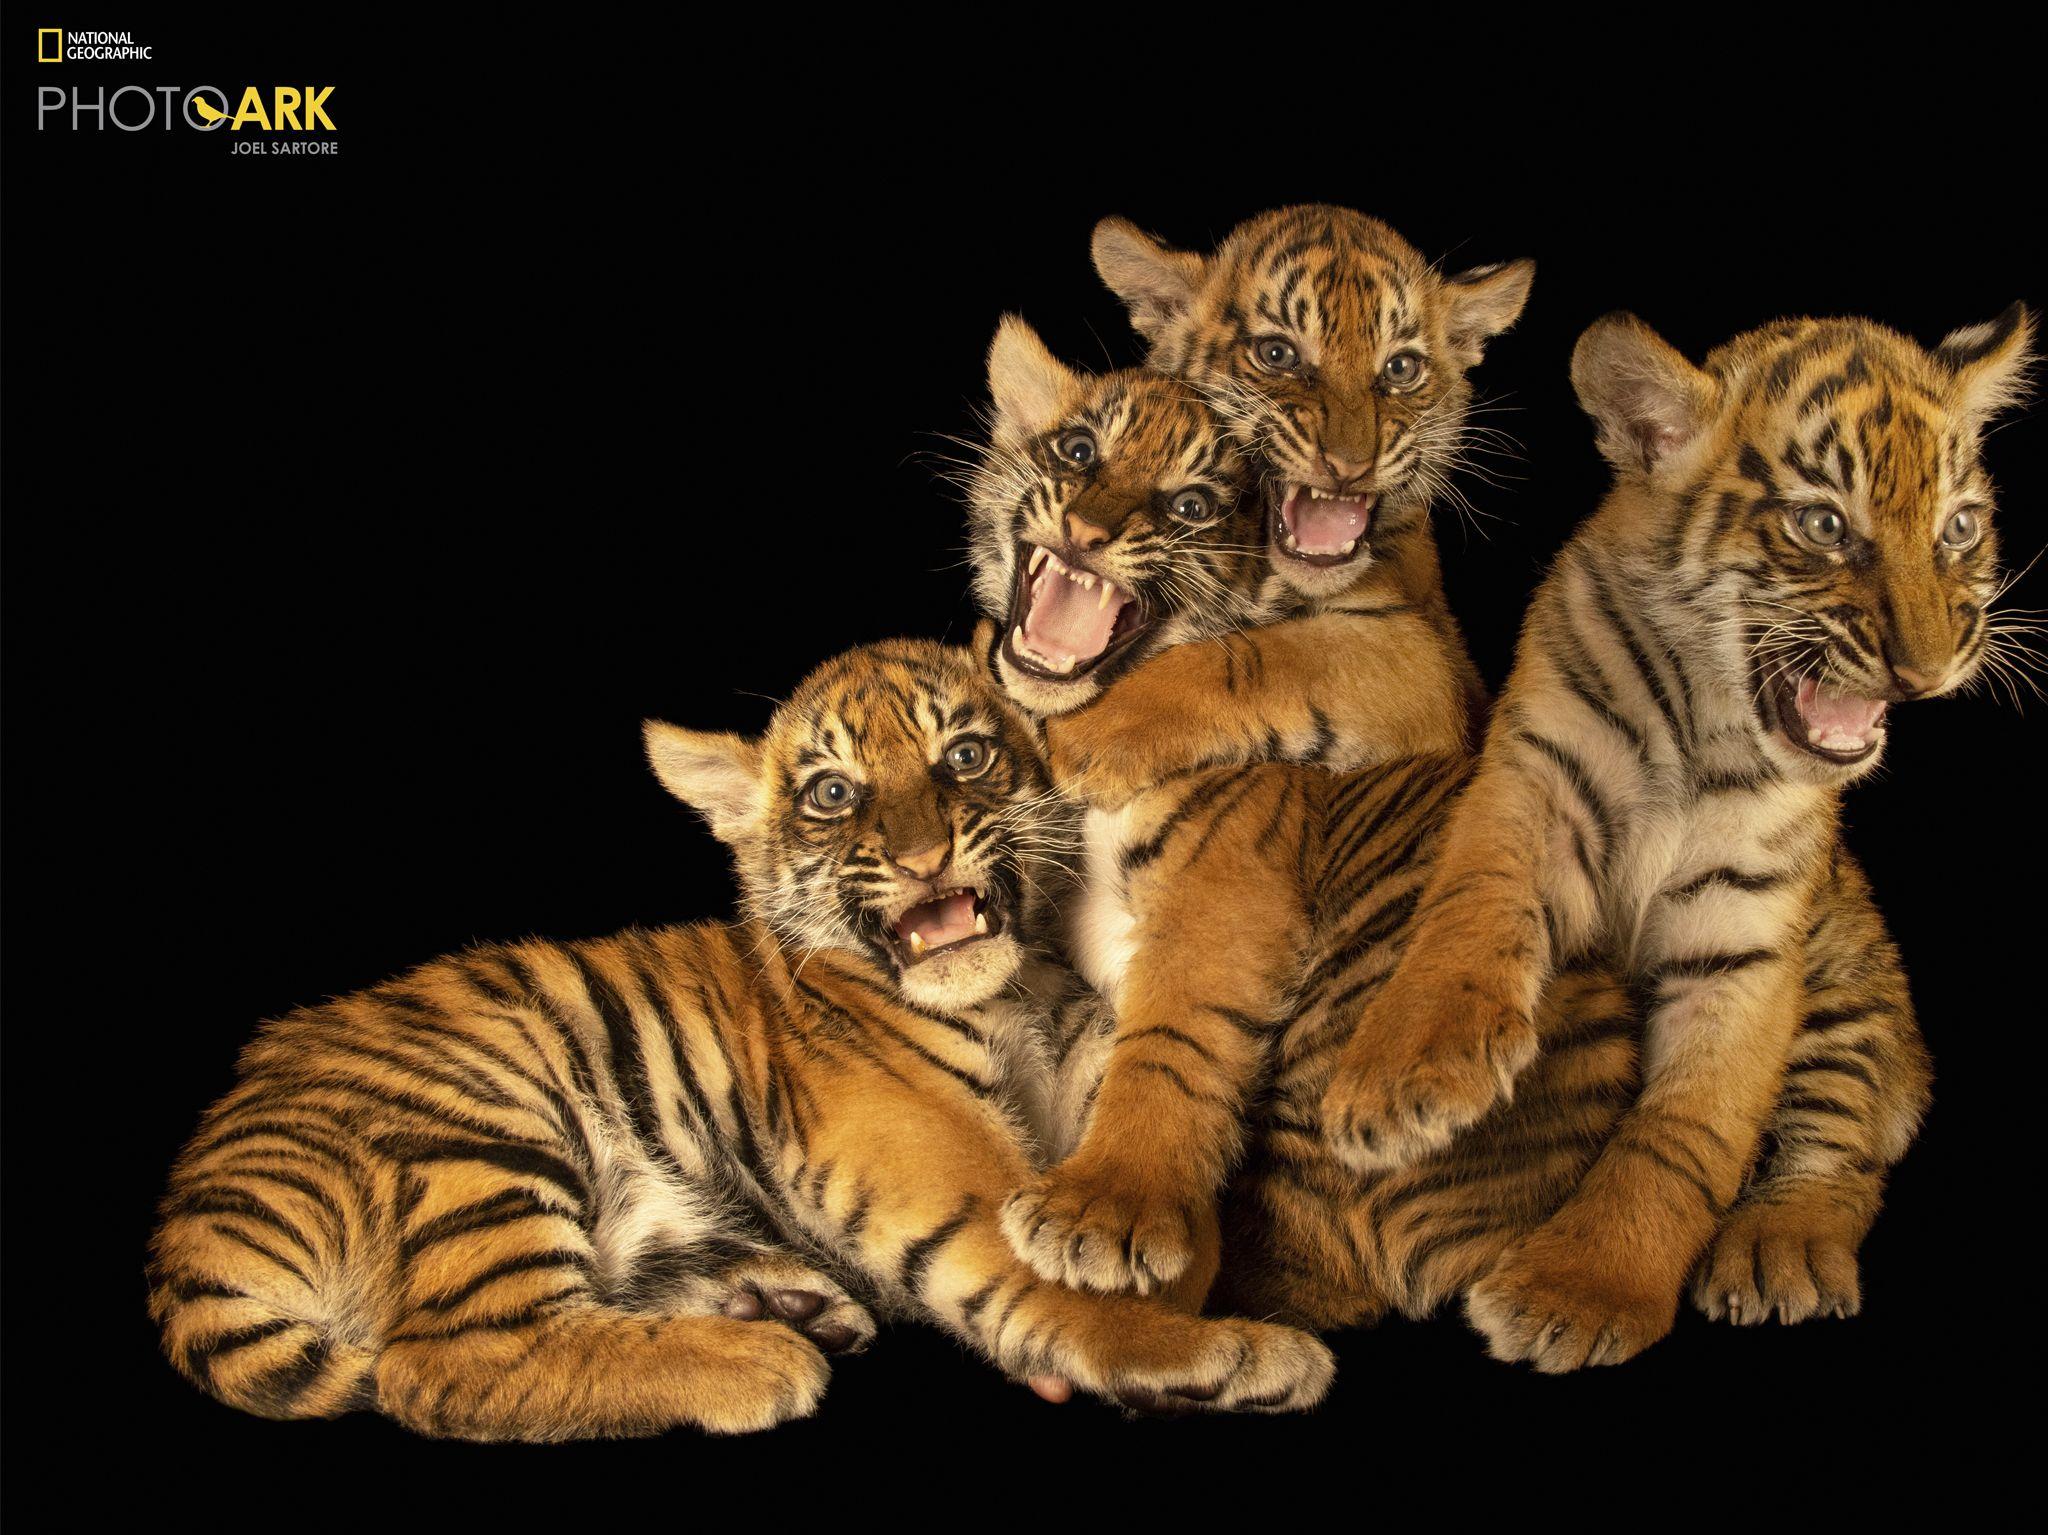 Four Sumatran tiger cubs, Panthera tigris sumatrae, at the Tierpark Berlin. This image is from... [Photo of the day - November 2020]